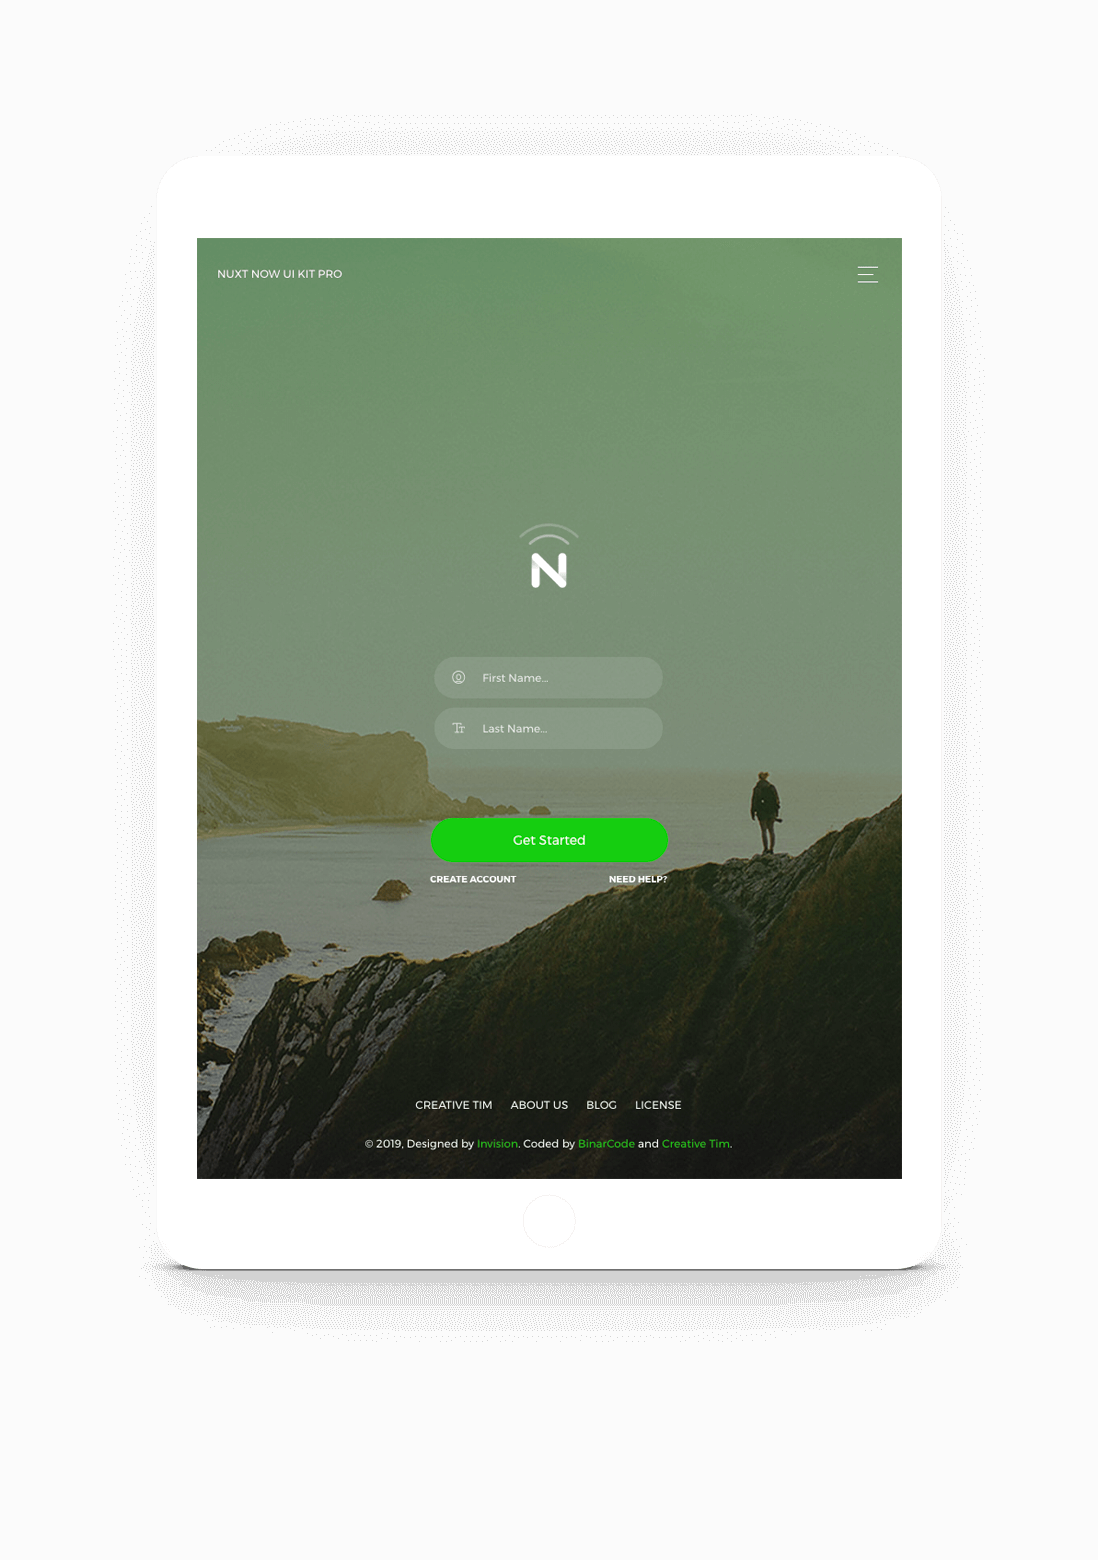 Nuxt Now UI Kit PRO